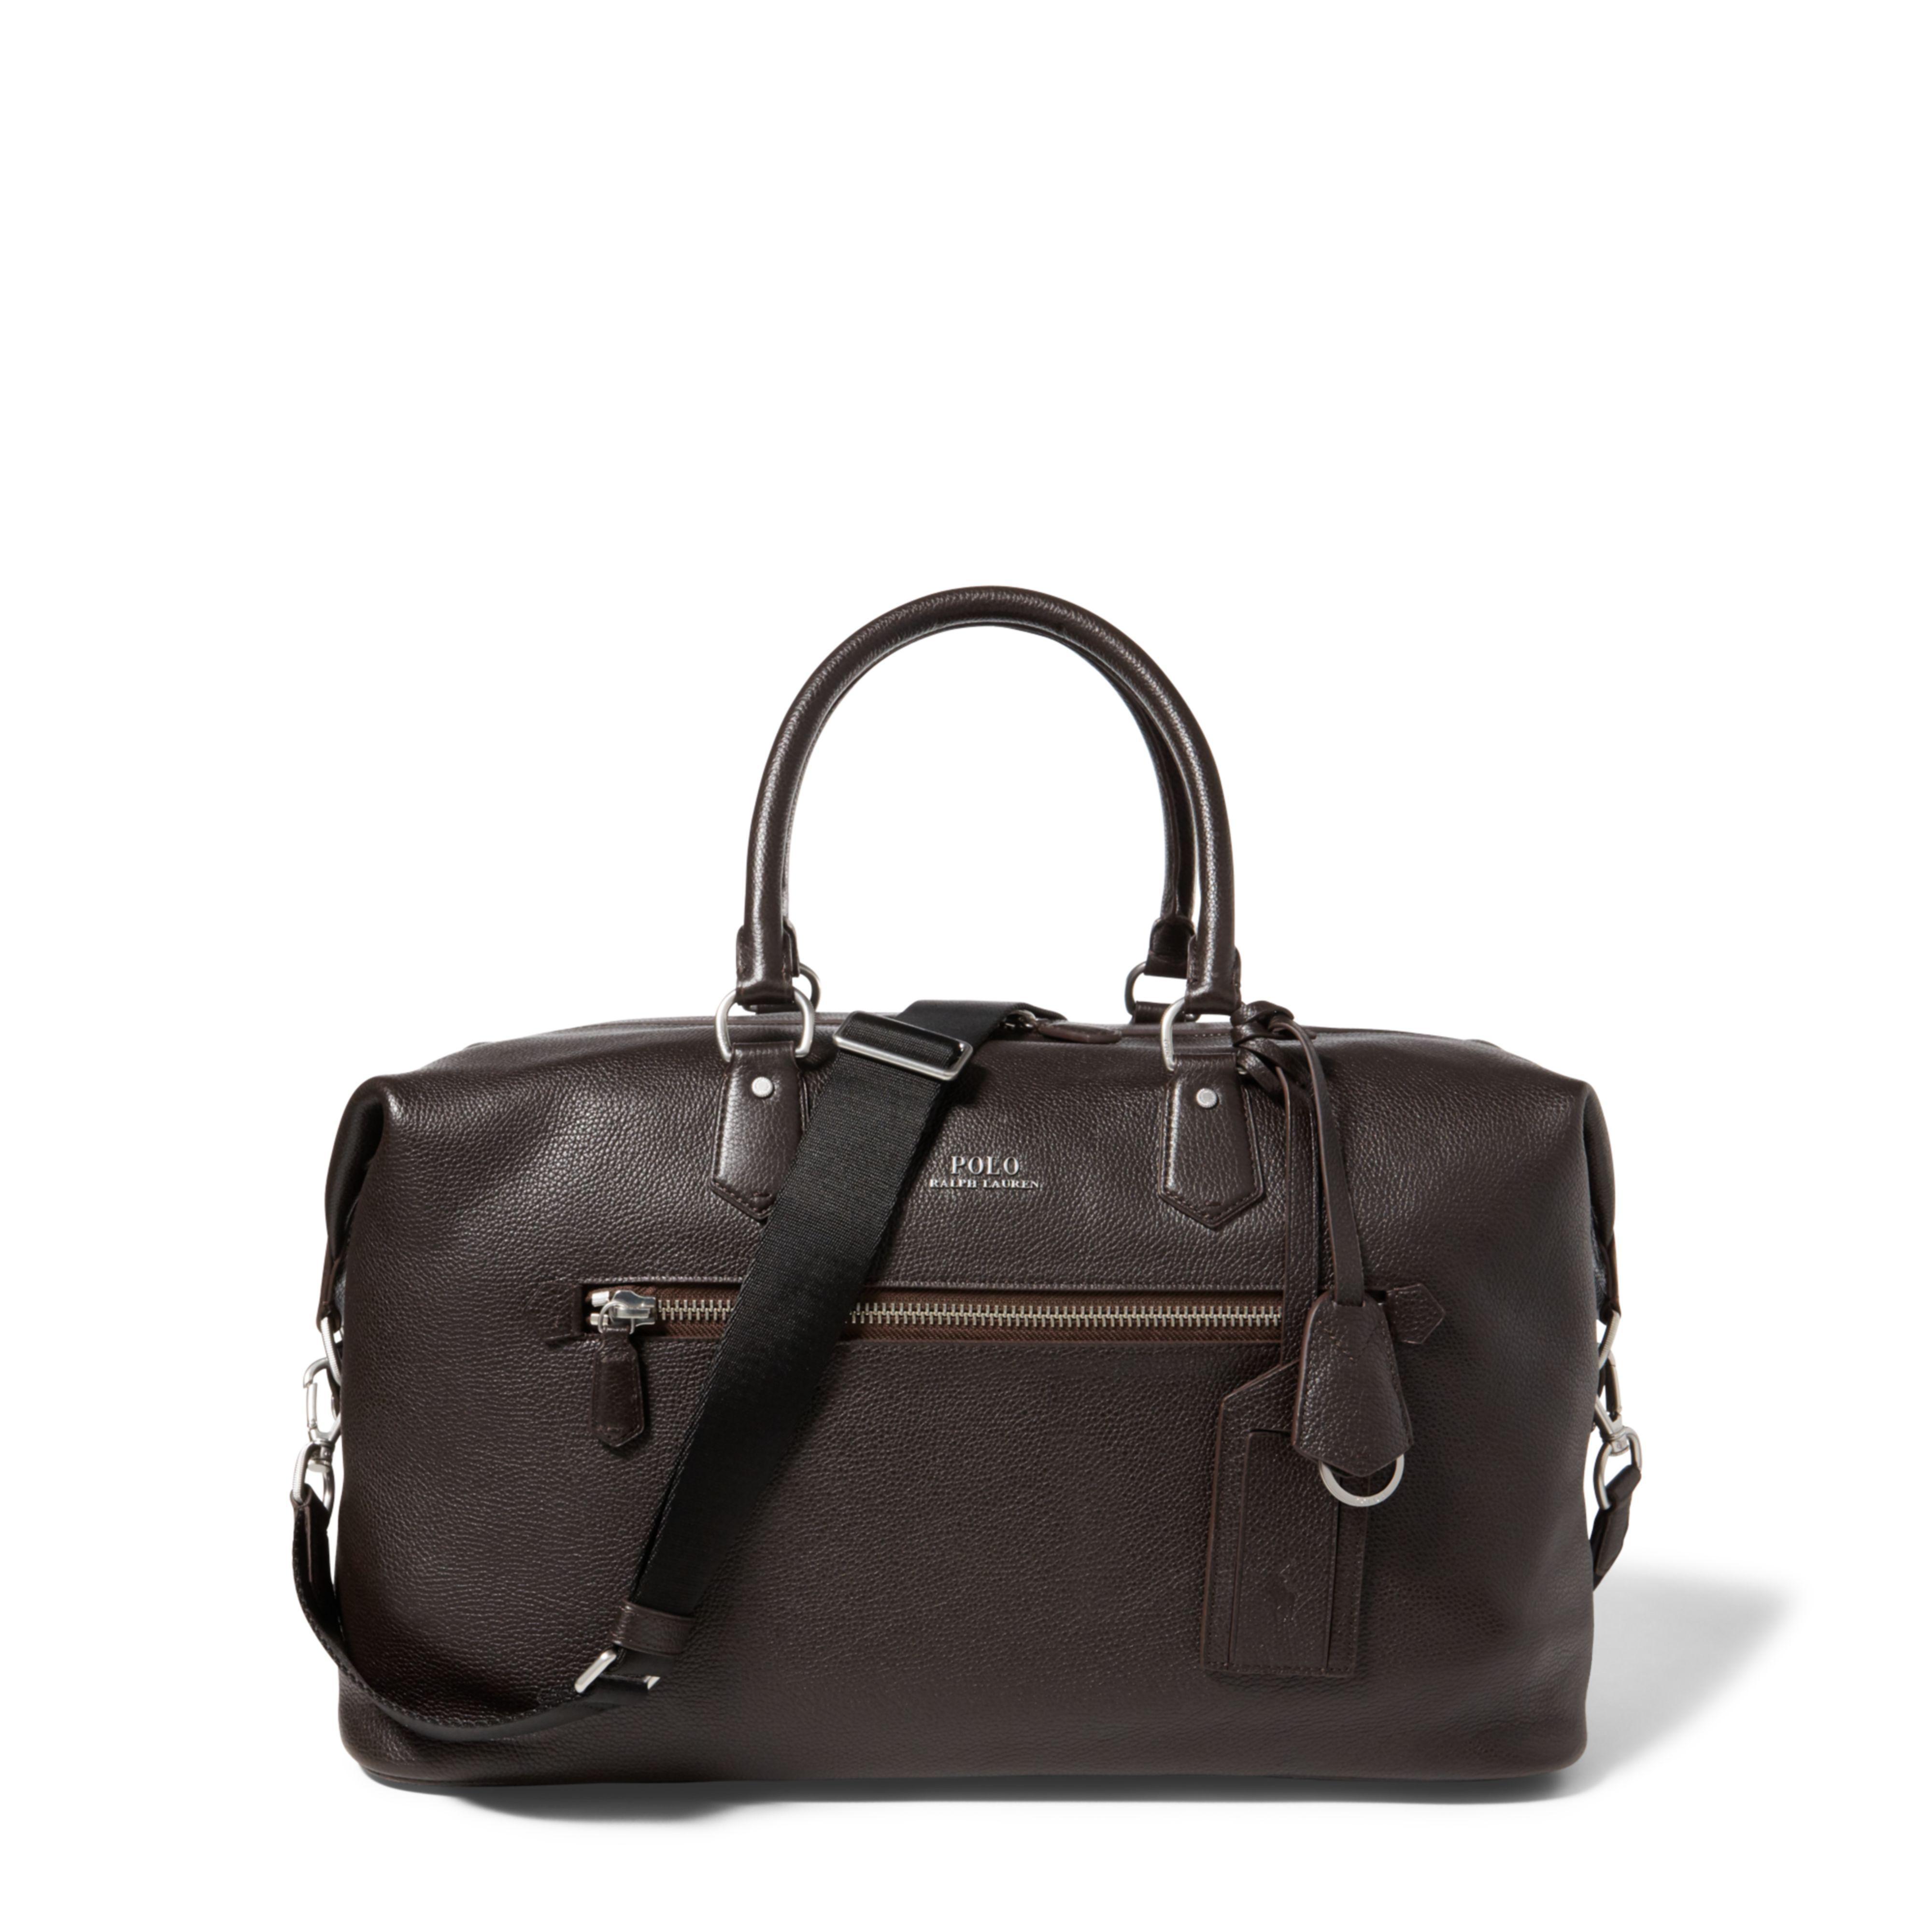 3fa03ffc46 new style polo ralph lauren classic bag lambskin e2dca 5b71b